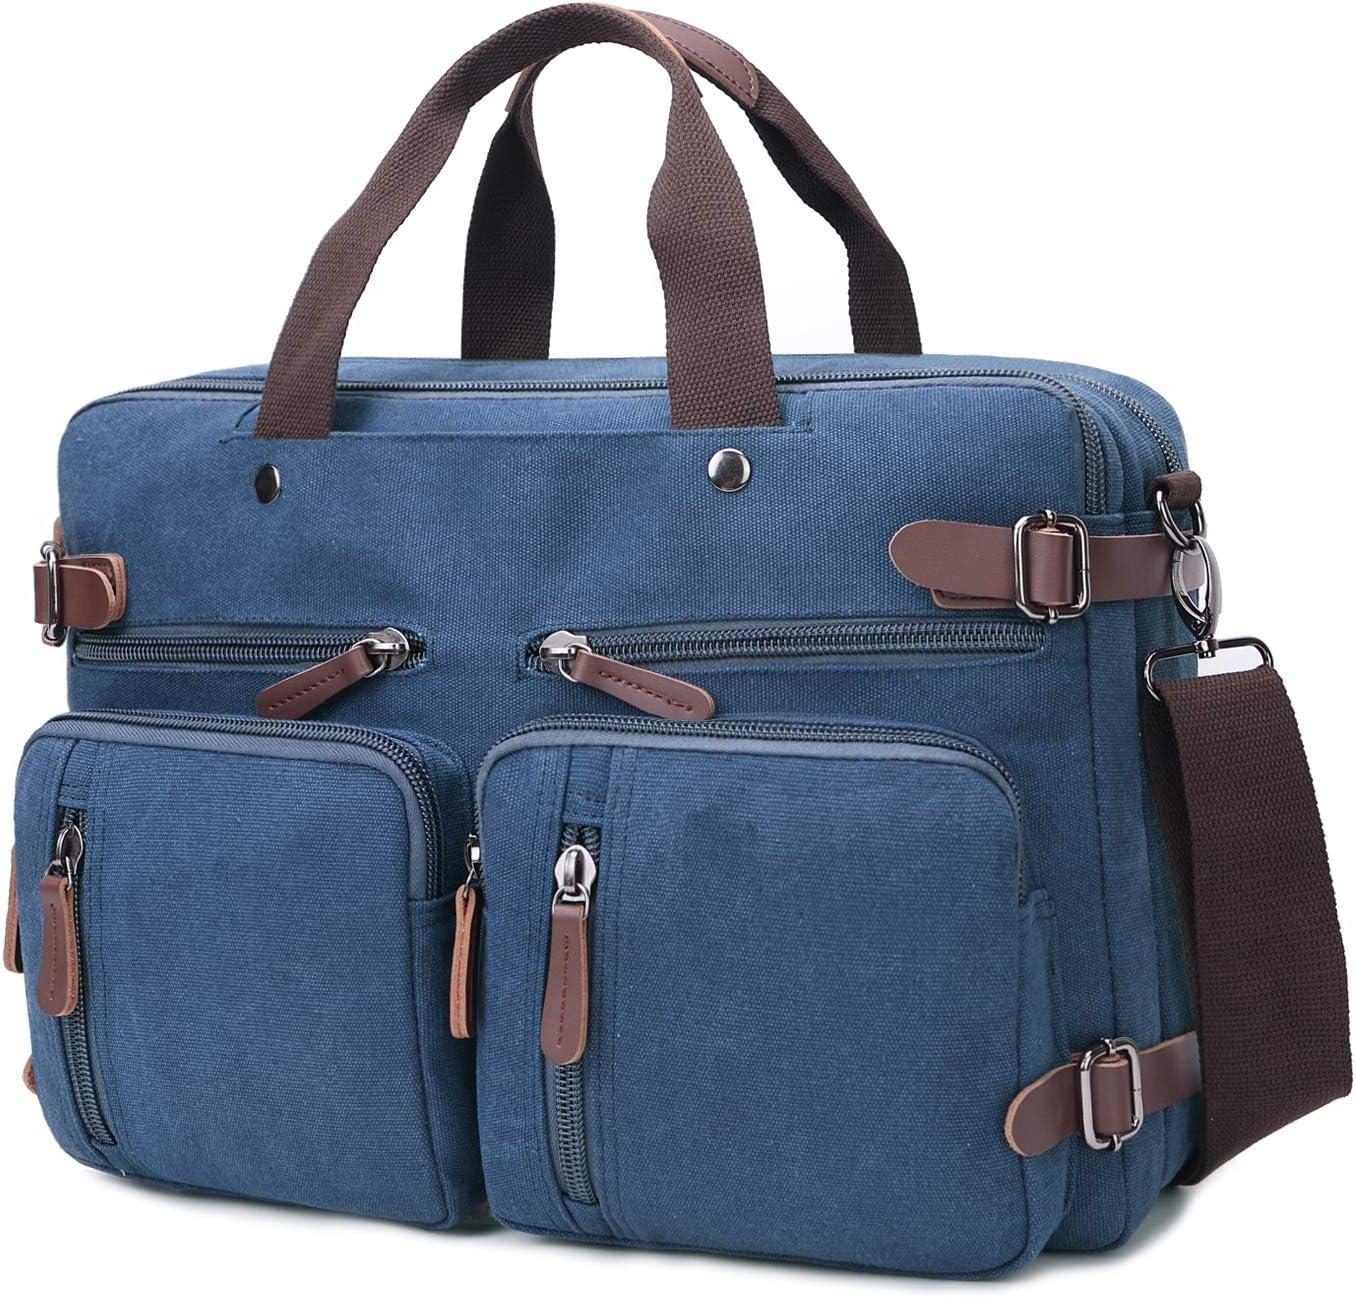 Convertible Laptop Backpack 17.3 Inch Messenger Bag for Men/Women (17.3 Inch, Blue)